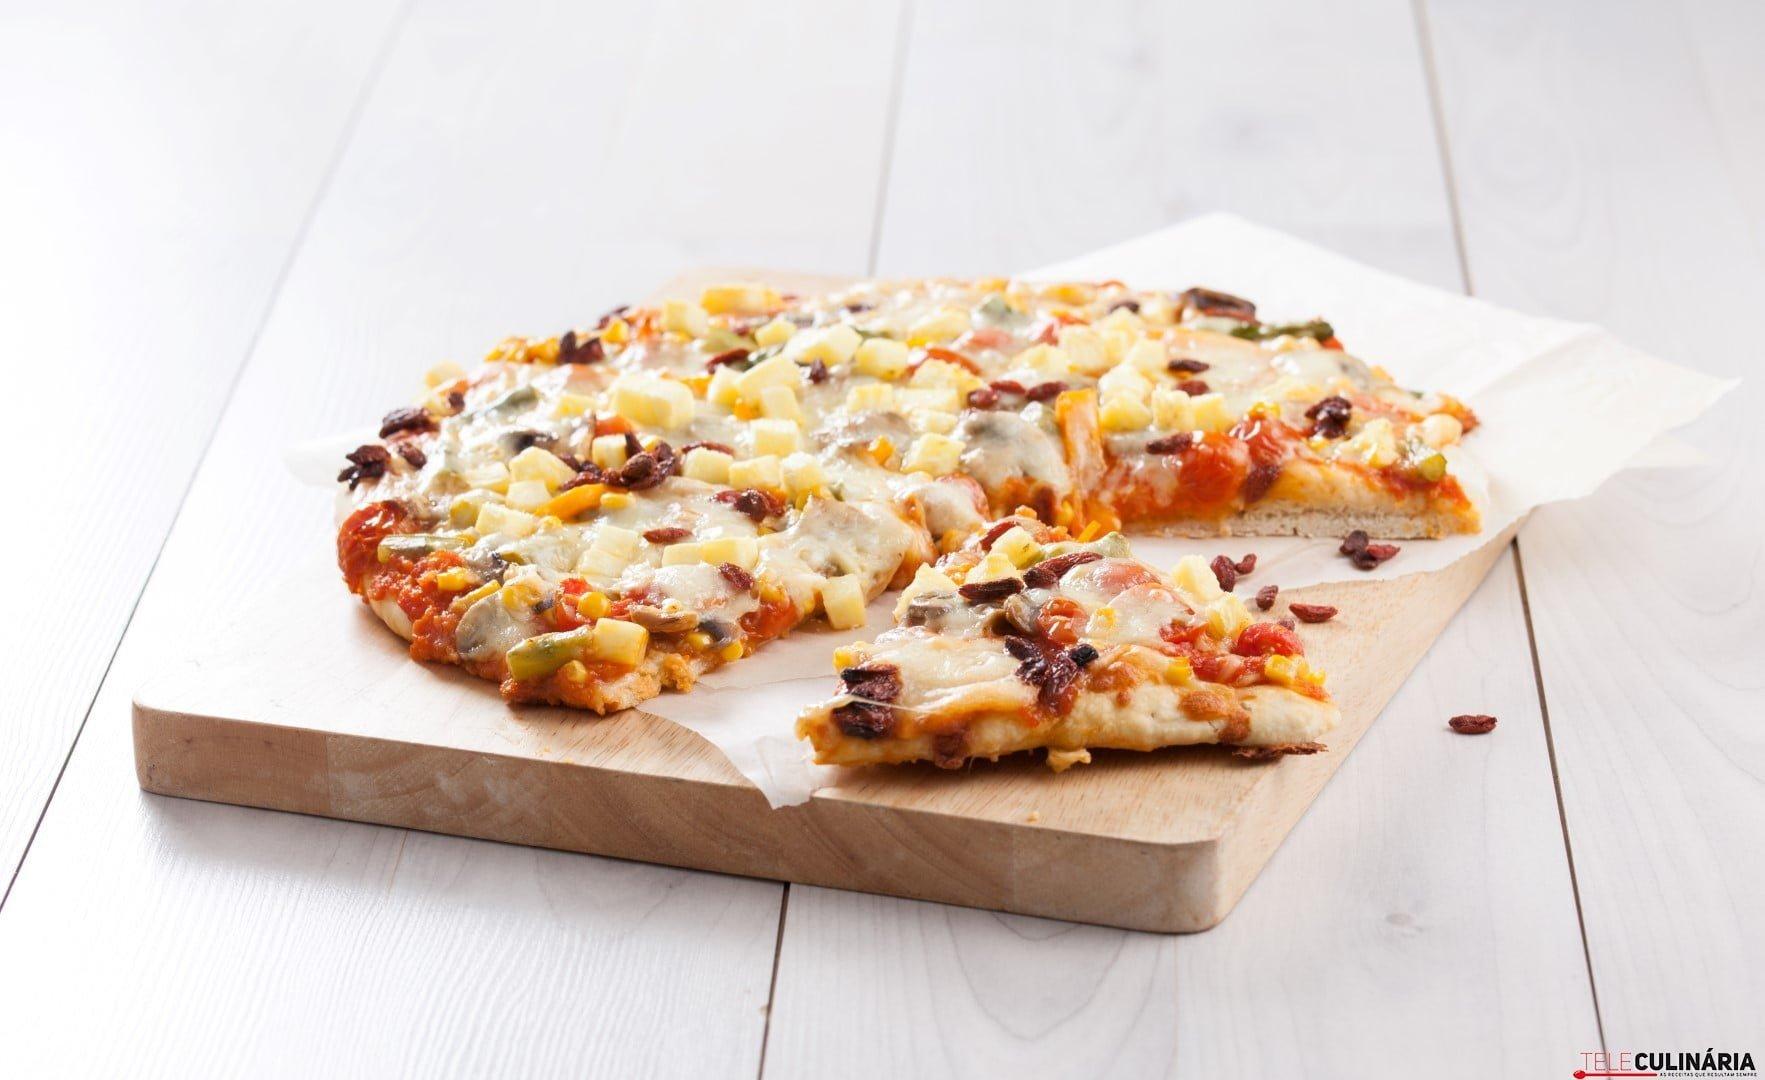 Pizza com legumes e fruta CHLM 2 Large